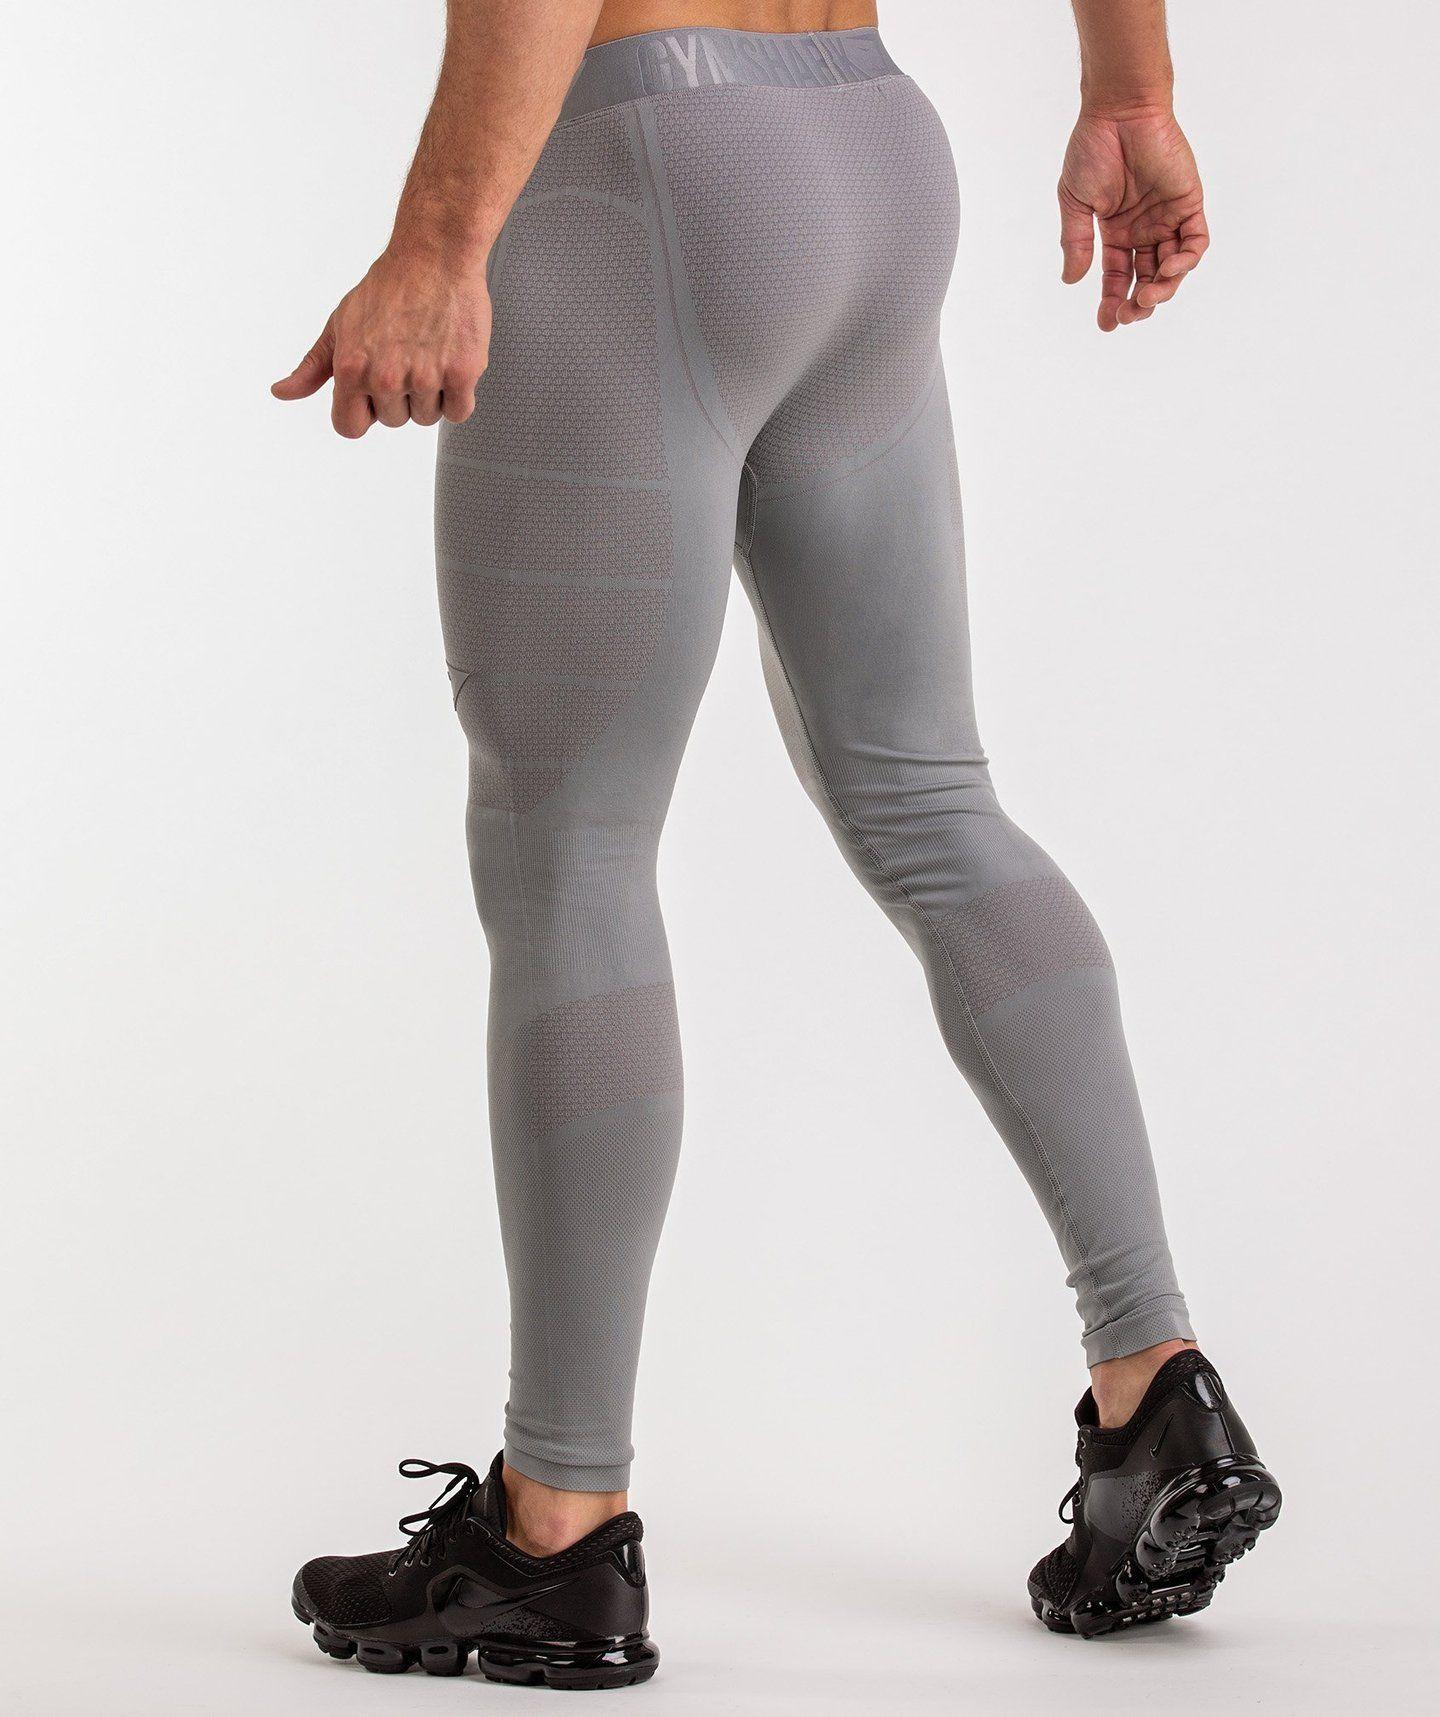 Gymshark Onyx Imperial Leggings - Light Grey 1  c3c8e7ae00a6b